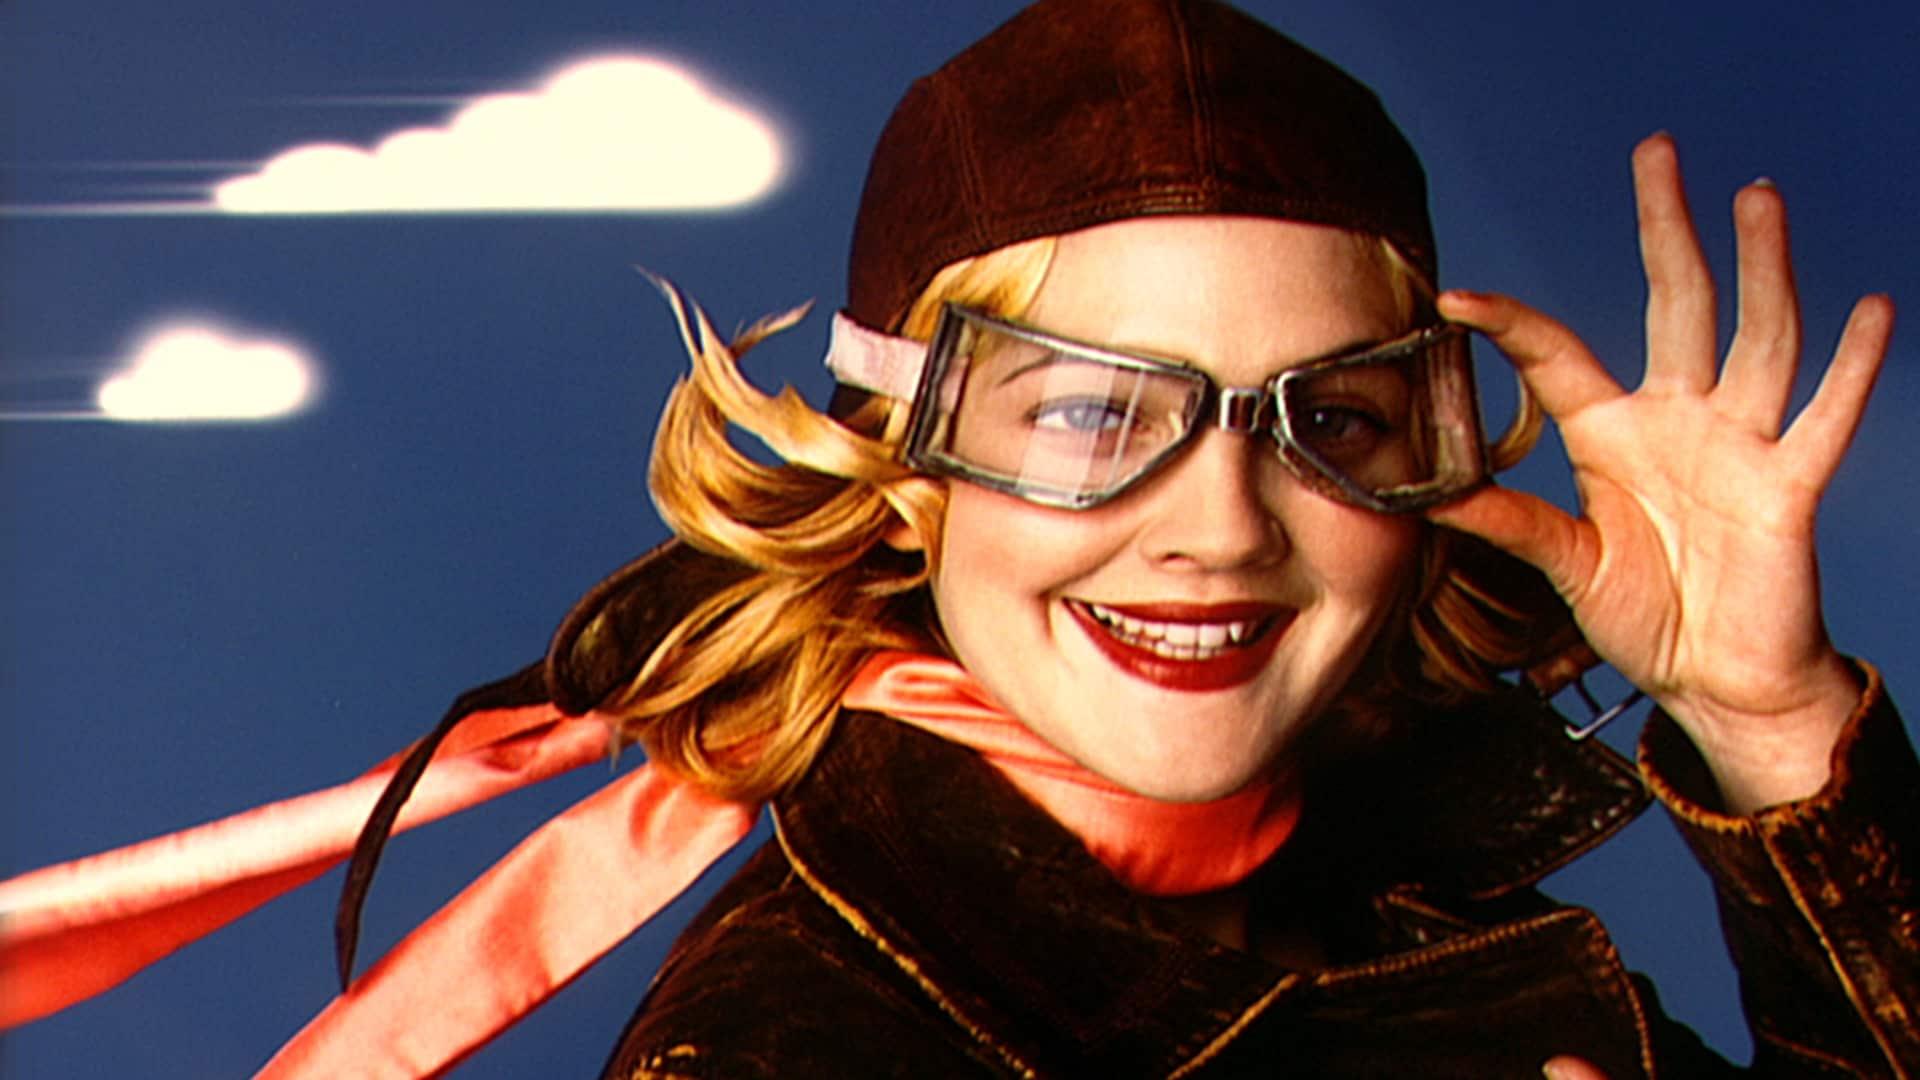 Drew Barrymore: March 20, 1999